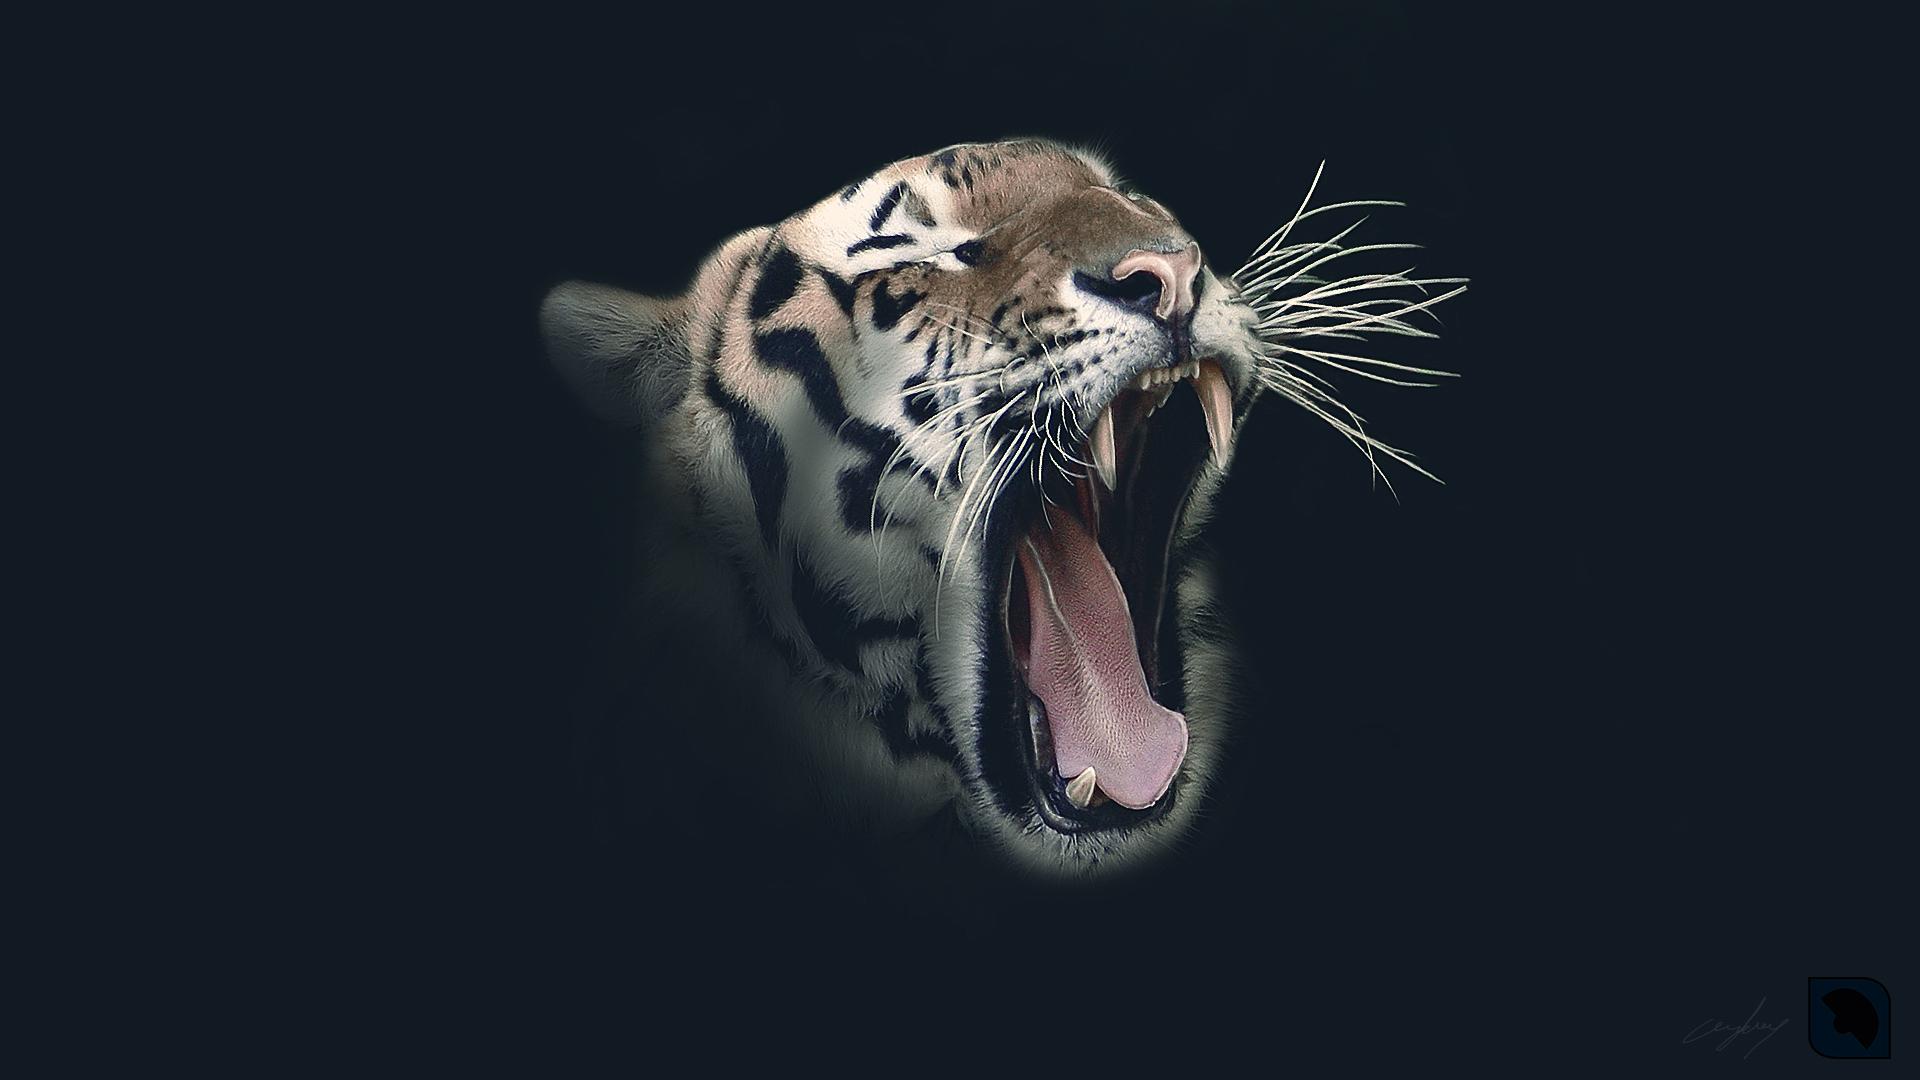 wallpaper tiger ceykey art deviantart 1920x1080